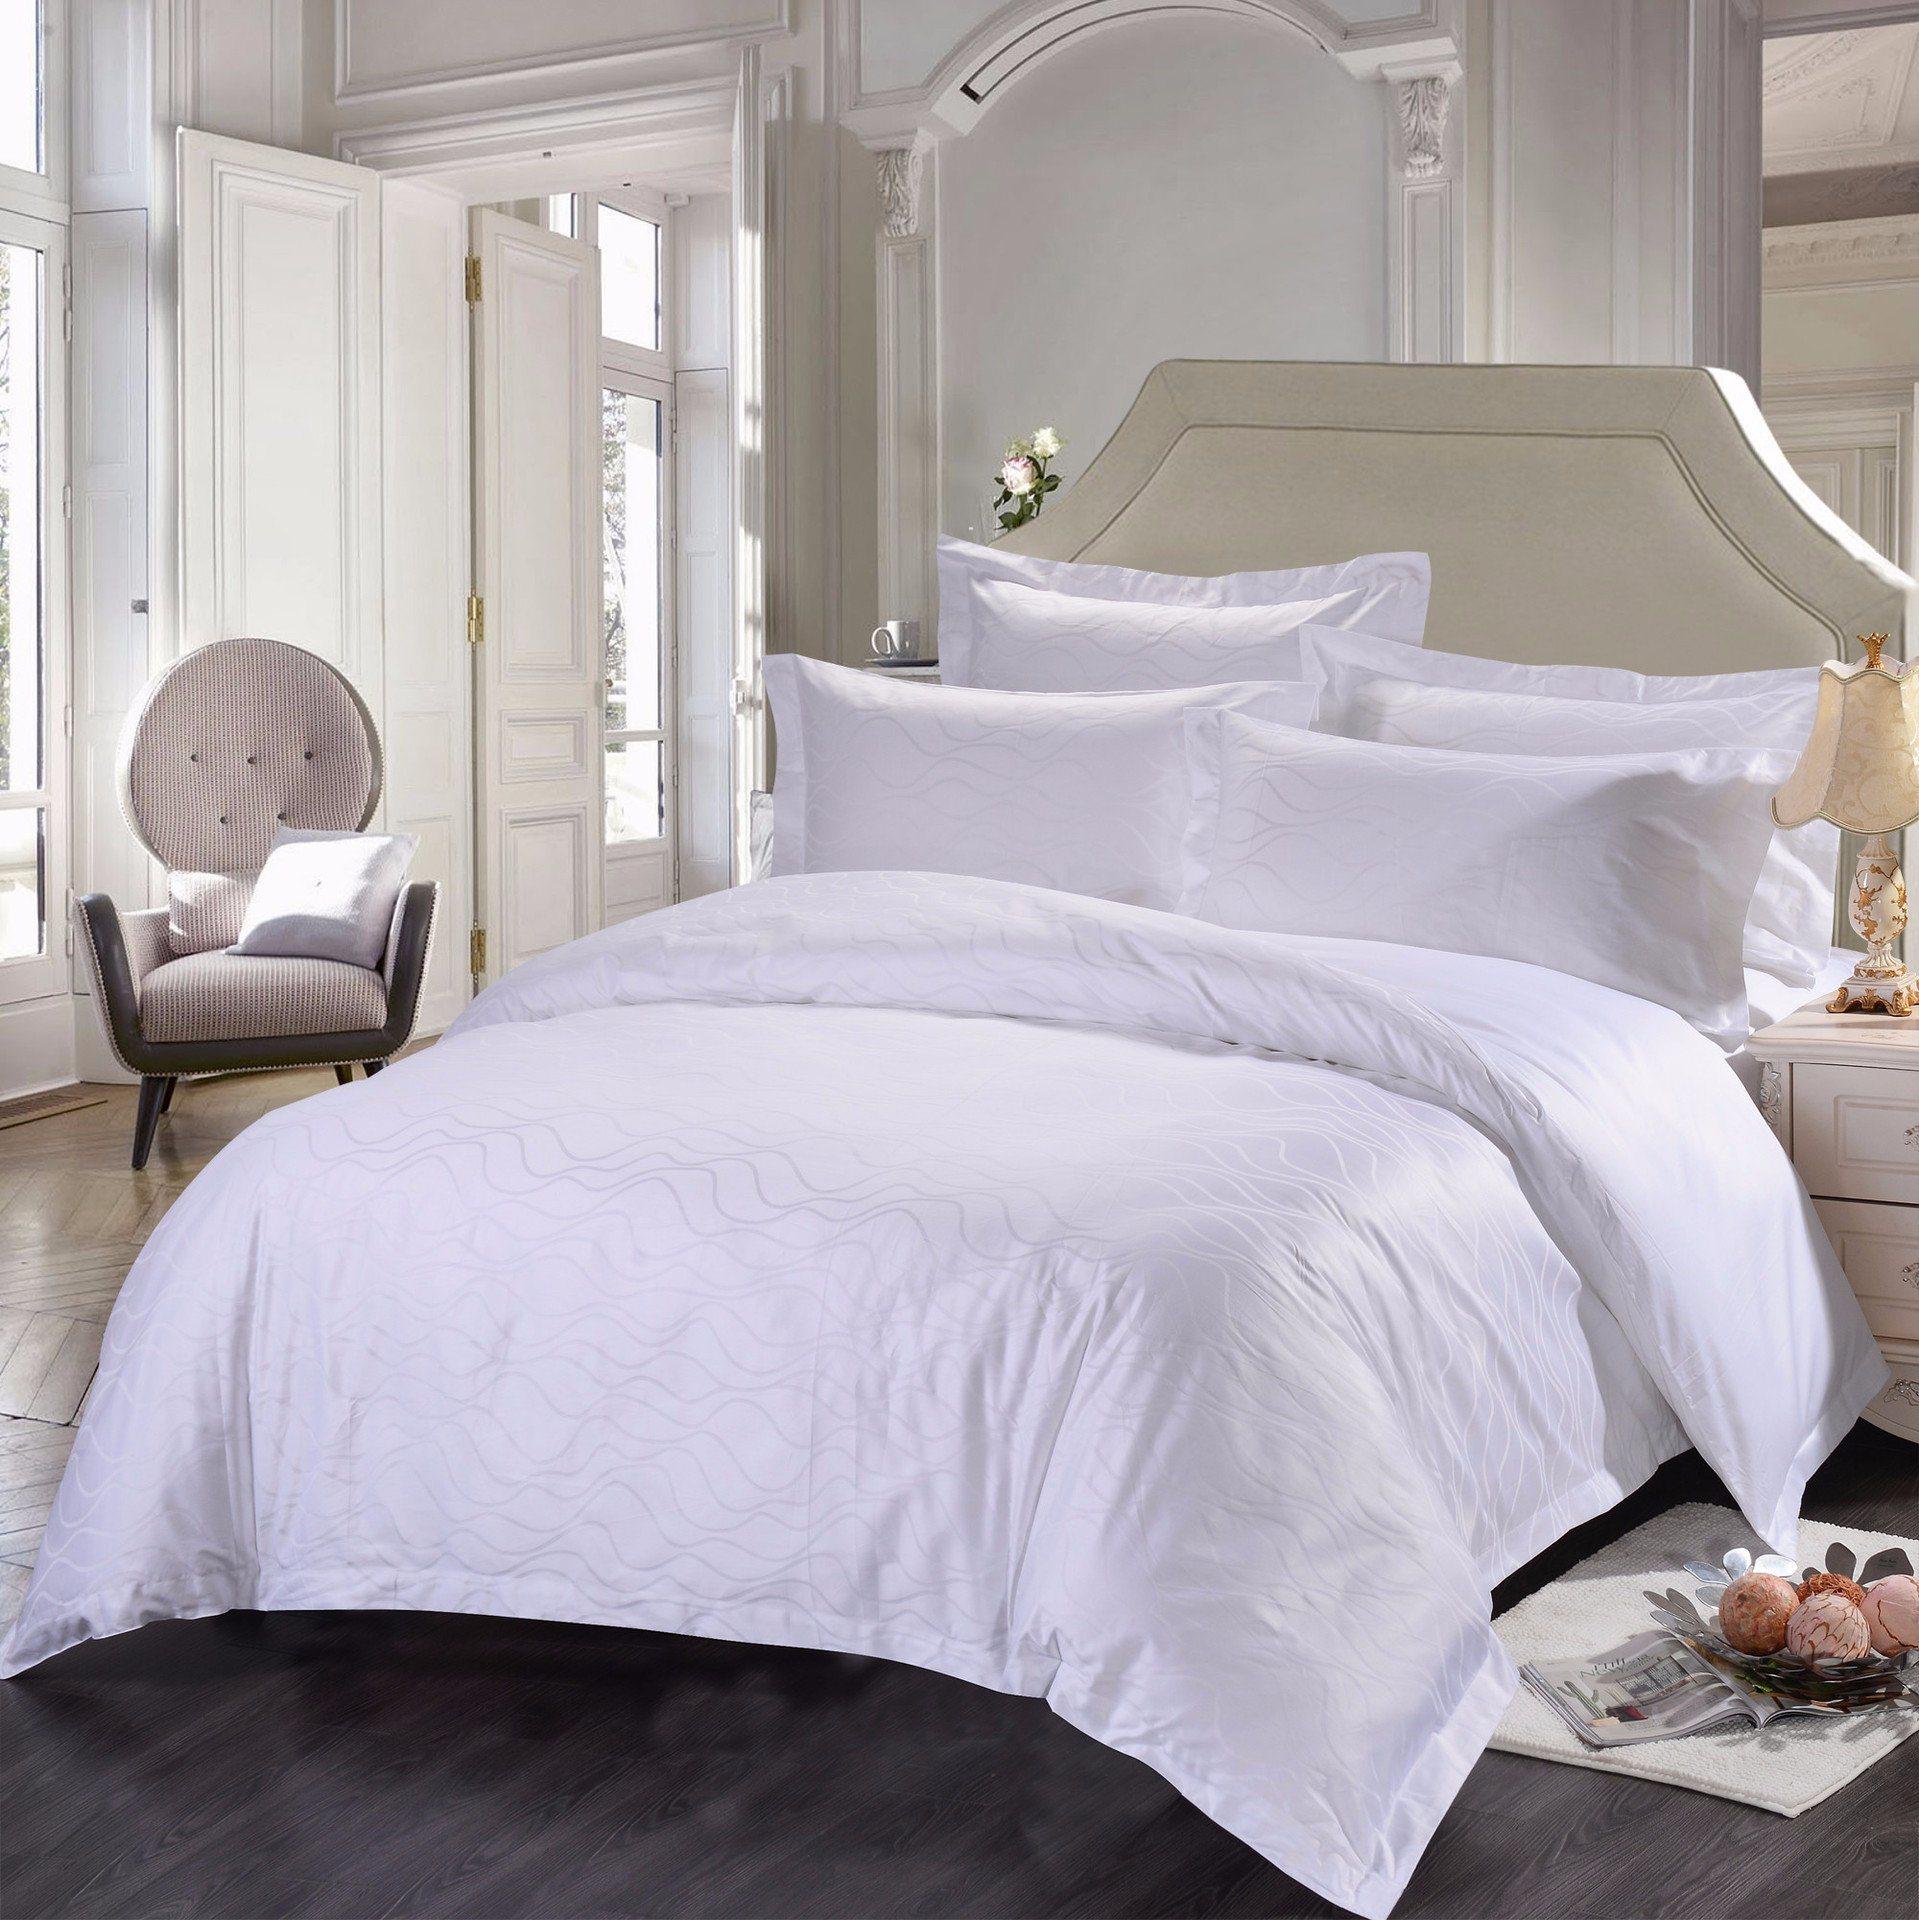 Charmant China Wholesale 100% Cotton Ripple Jacquard Sheet Sets Hotel Bedding Set Bed  Linen   China Jacquard Bedding, Hotel Bed Sheets